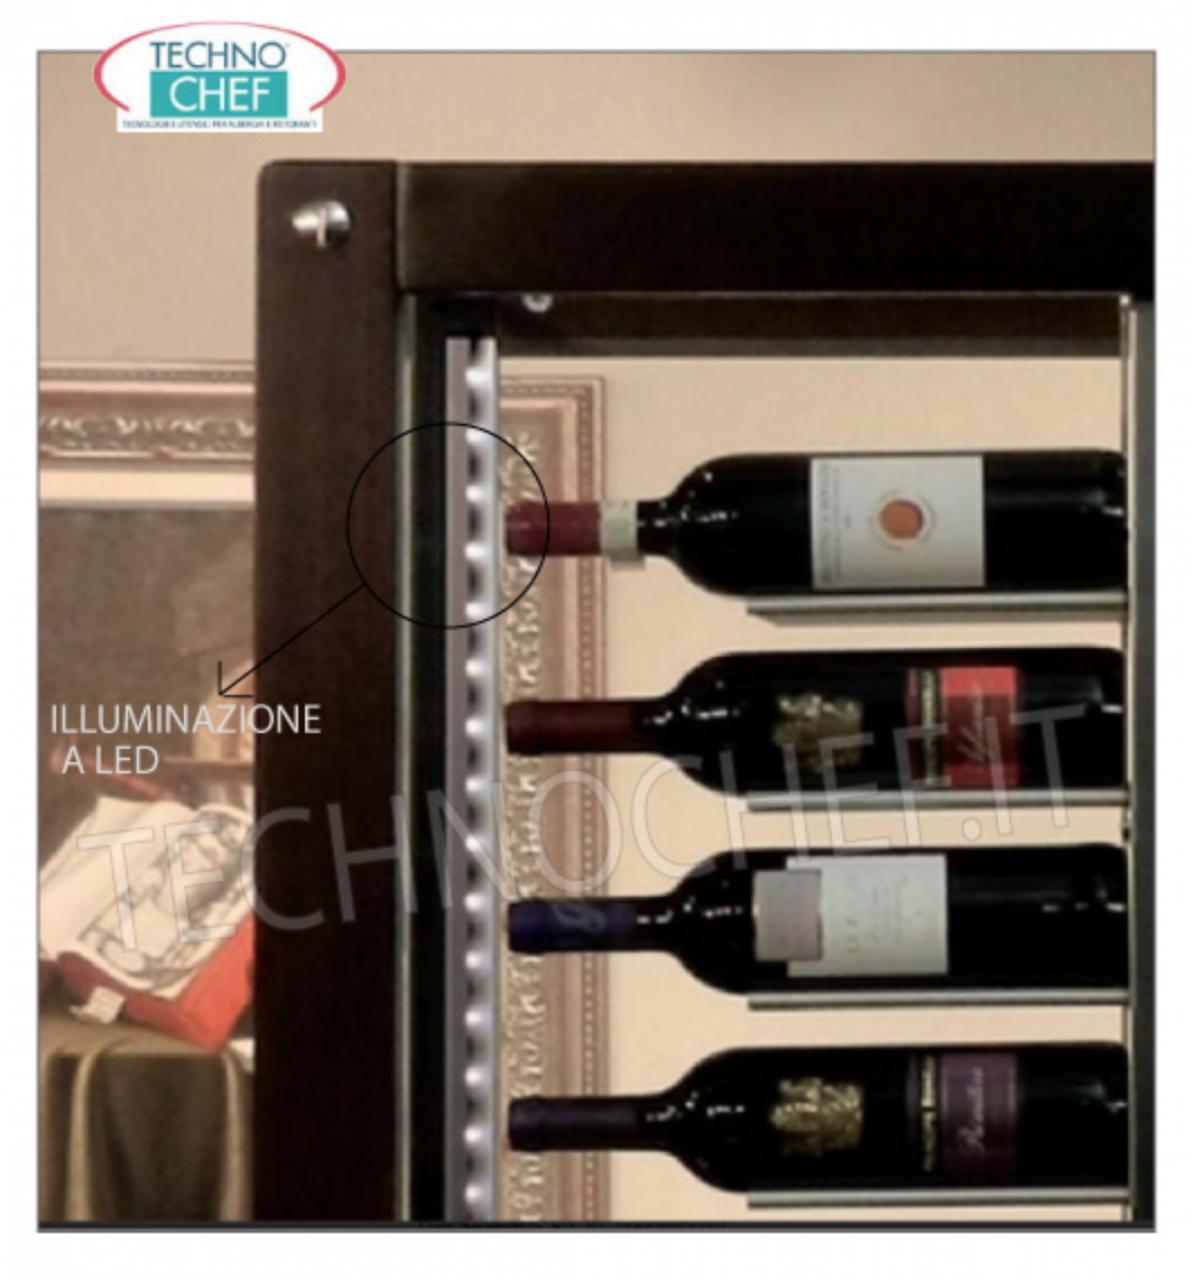 Frigor per vini frigoriferi industriali professionali for Frigoriferi rossi